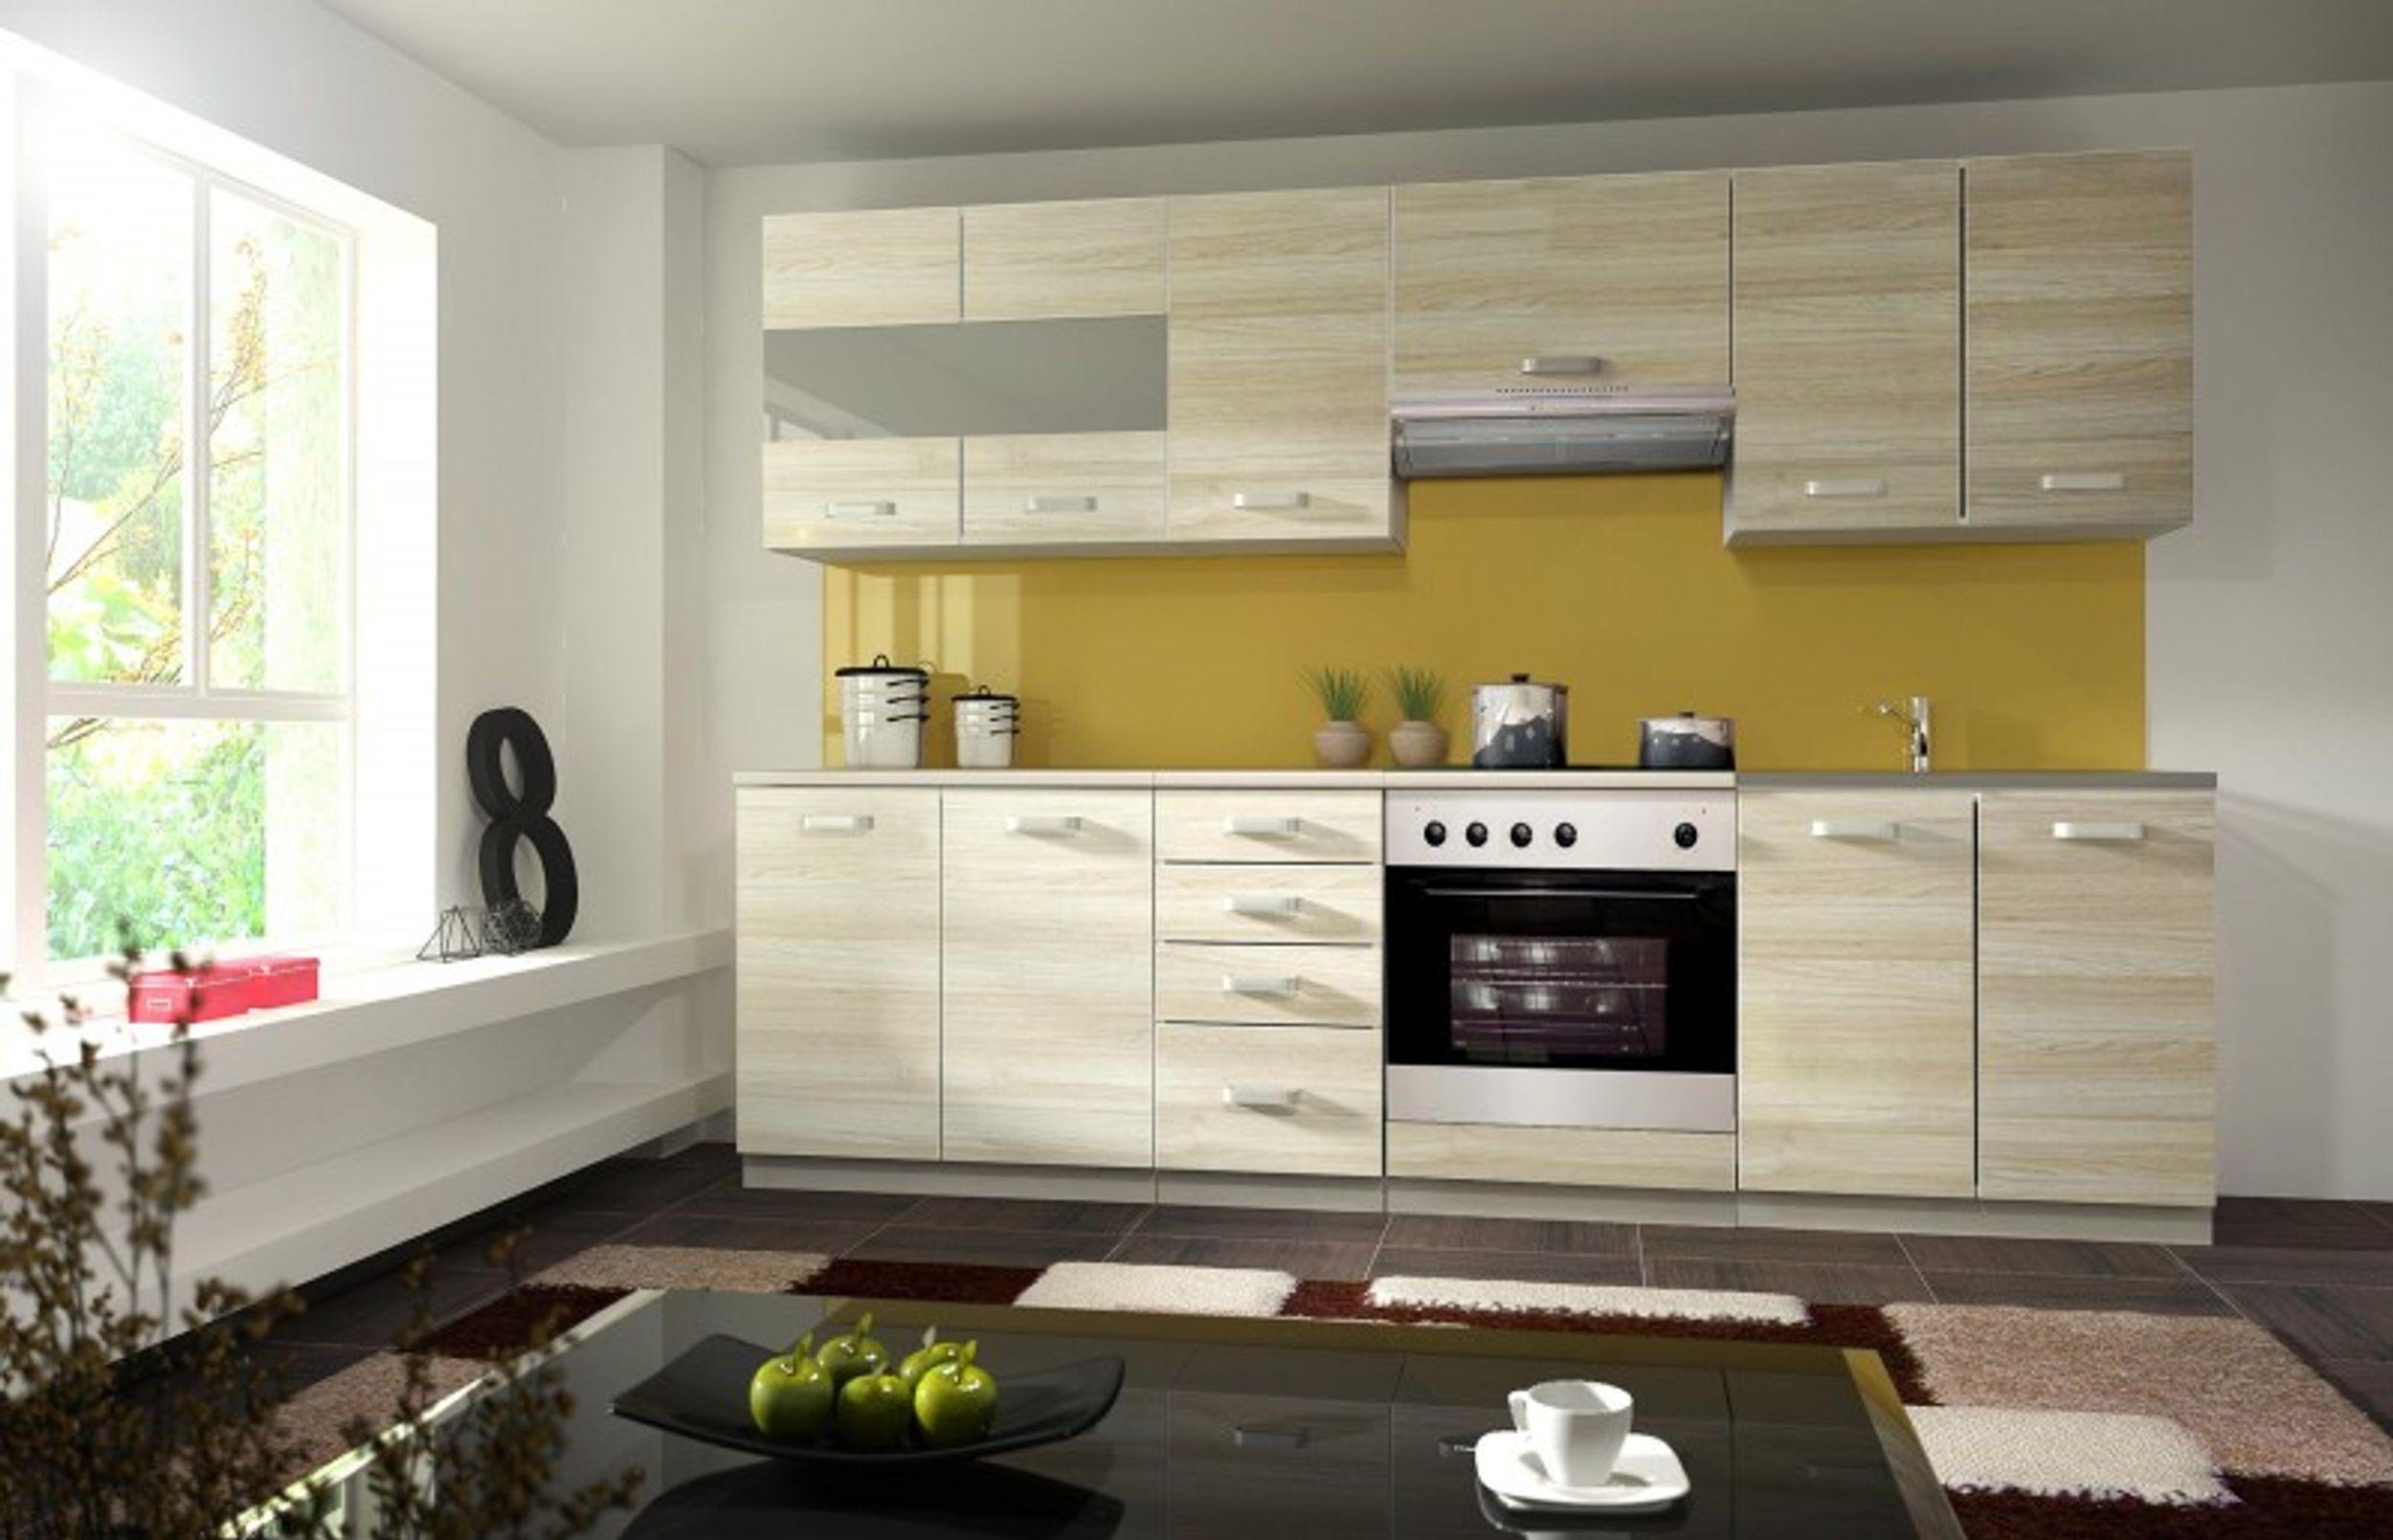 k che wiktoria 260cm k chenzeile k chenblock variabel stellbar in eichenholzoptik chamonix. Black Bedroom Furniture Sets. Home Design Ideas